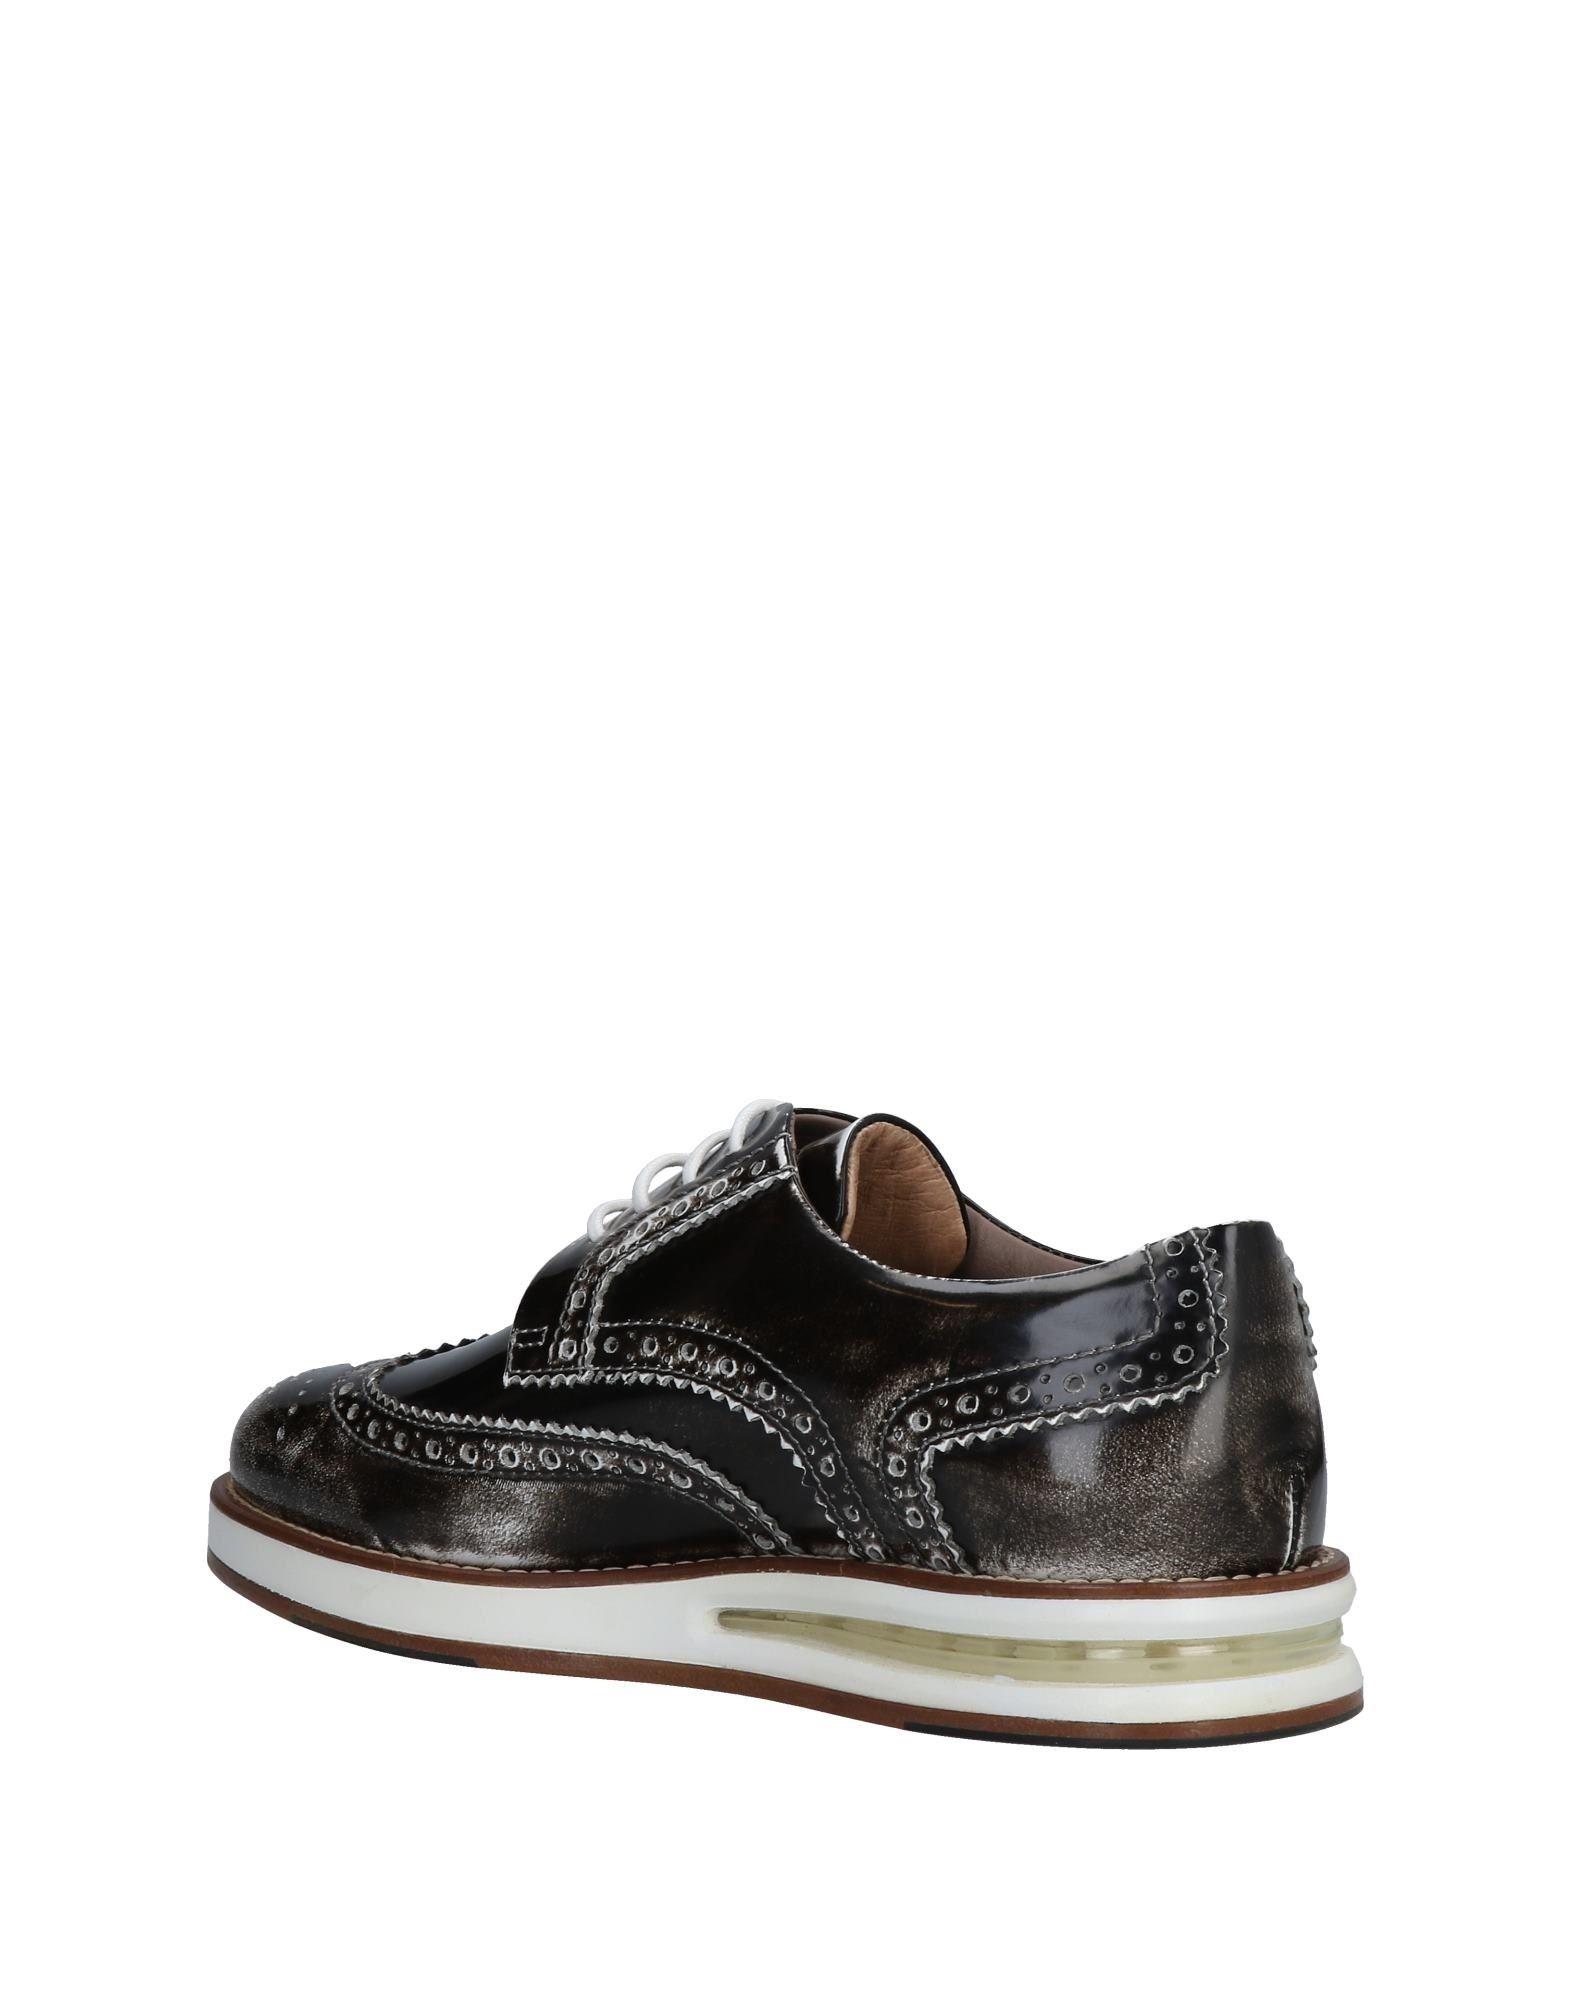 Rabatt echte Schuhe Barleycorn  Schnürschuhe Herren  Barleycorn 11475105UF 3c79a2